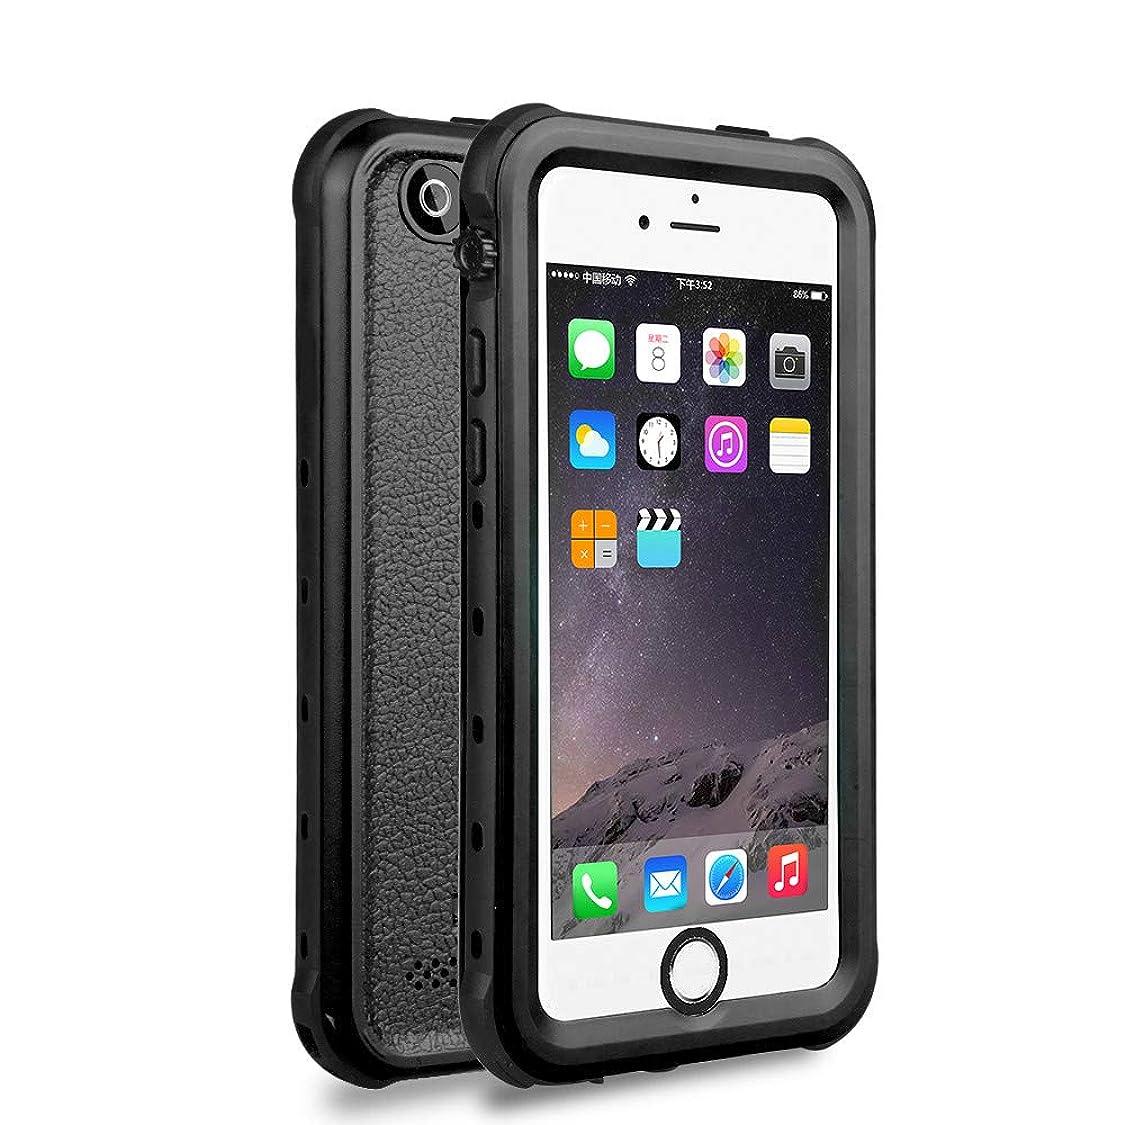 iPhone5/5s/SE 防水ケース DINGXIN 指紋認証対応 防水 防雪 防塵 耐震 耐衝撃 IP68防水規格 アイフォン5s フォンケース5 フォンケースse 防水ケース 防水カバー ストラップホール付き (iPhone5/5s/SSE, 黒)